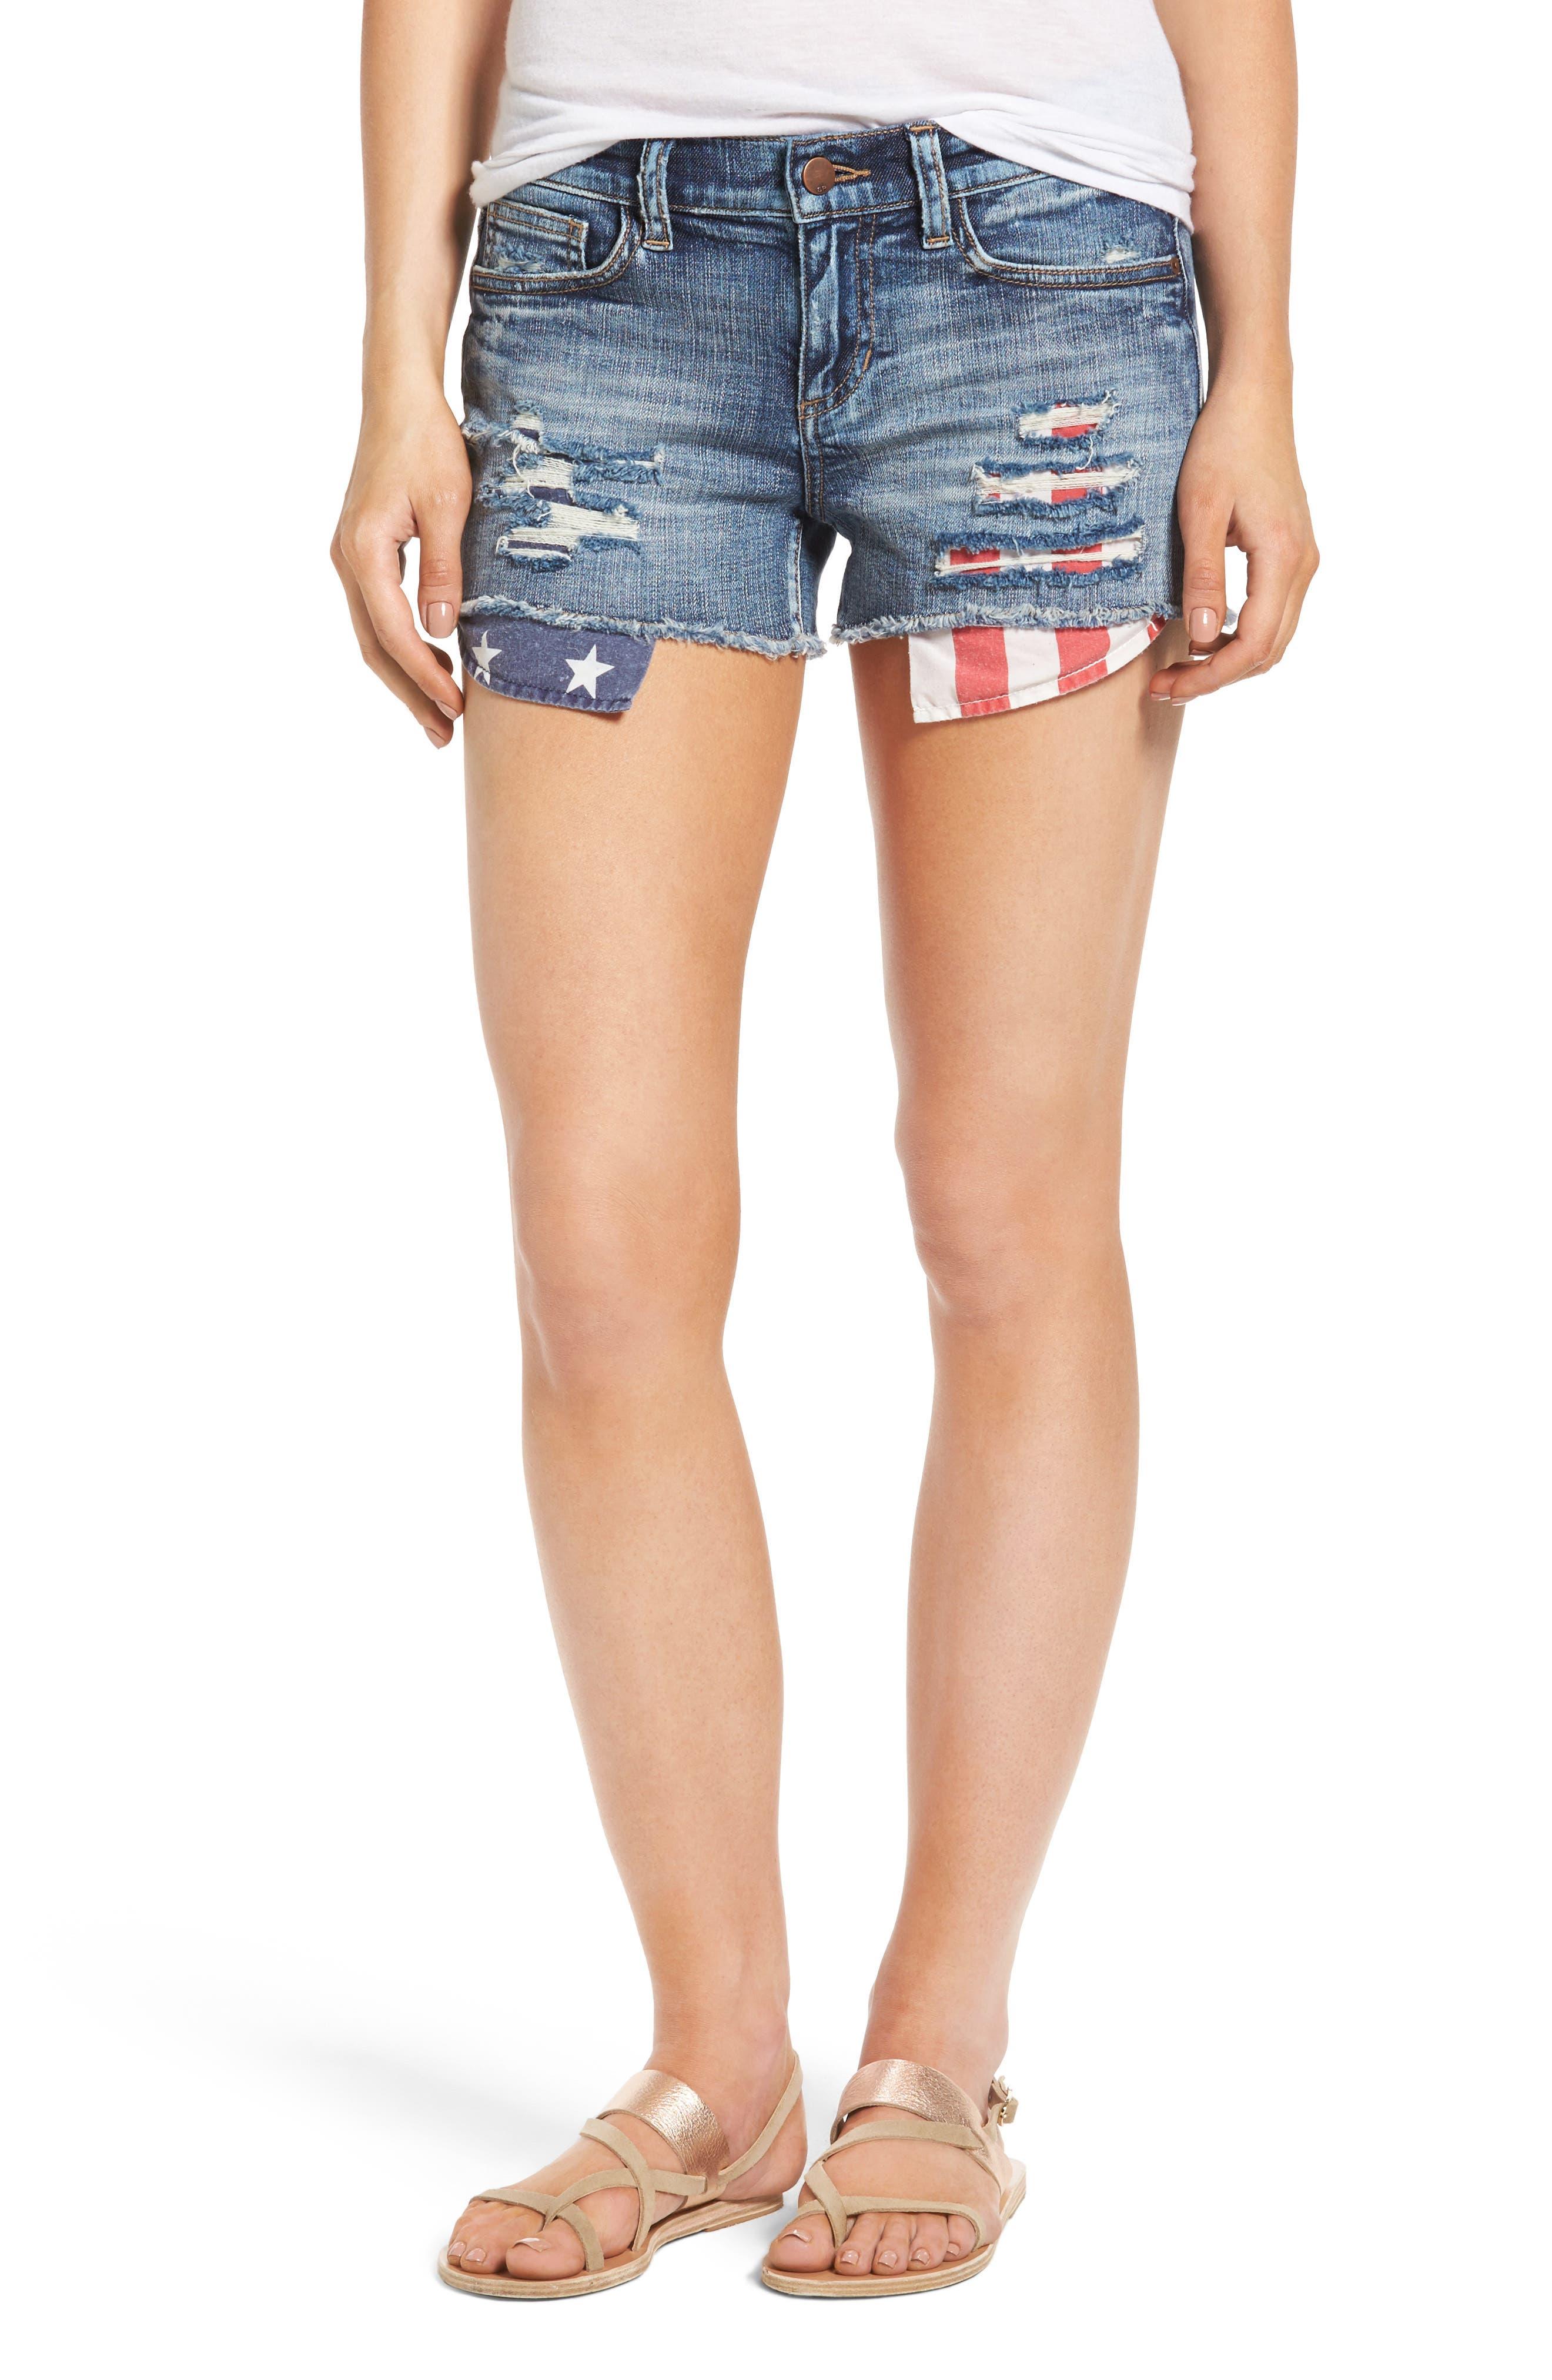 SP Black Stars & Sripes Denim Shorts